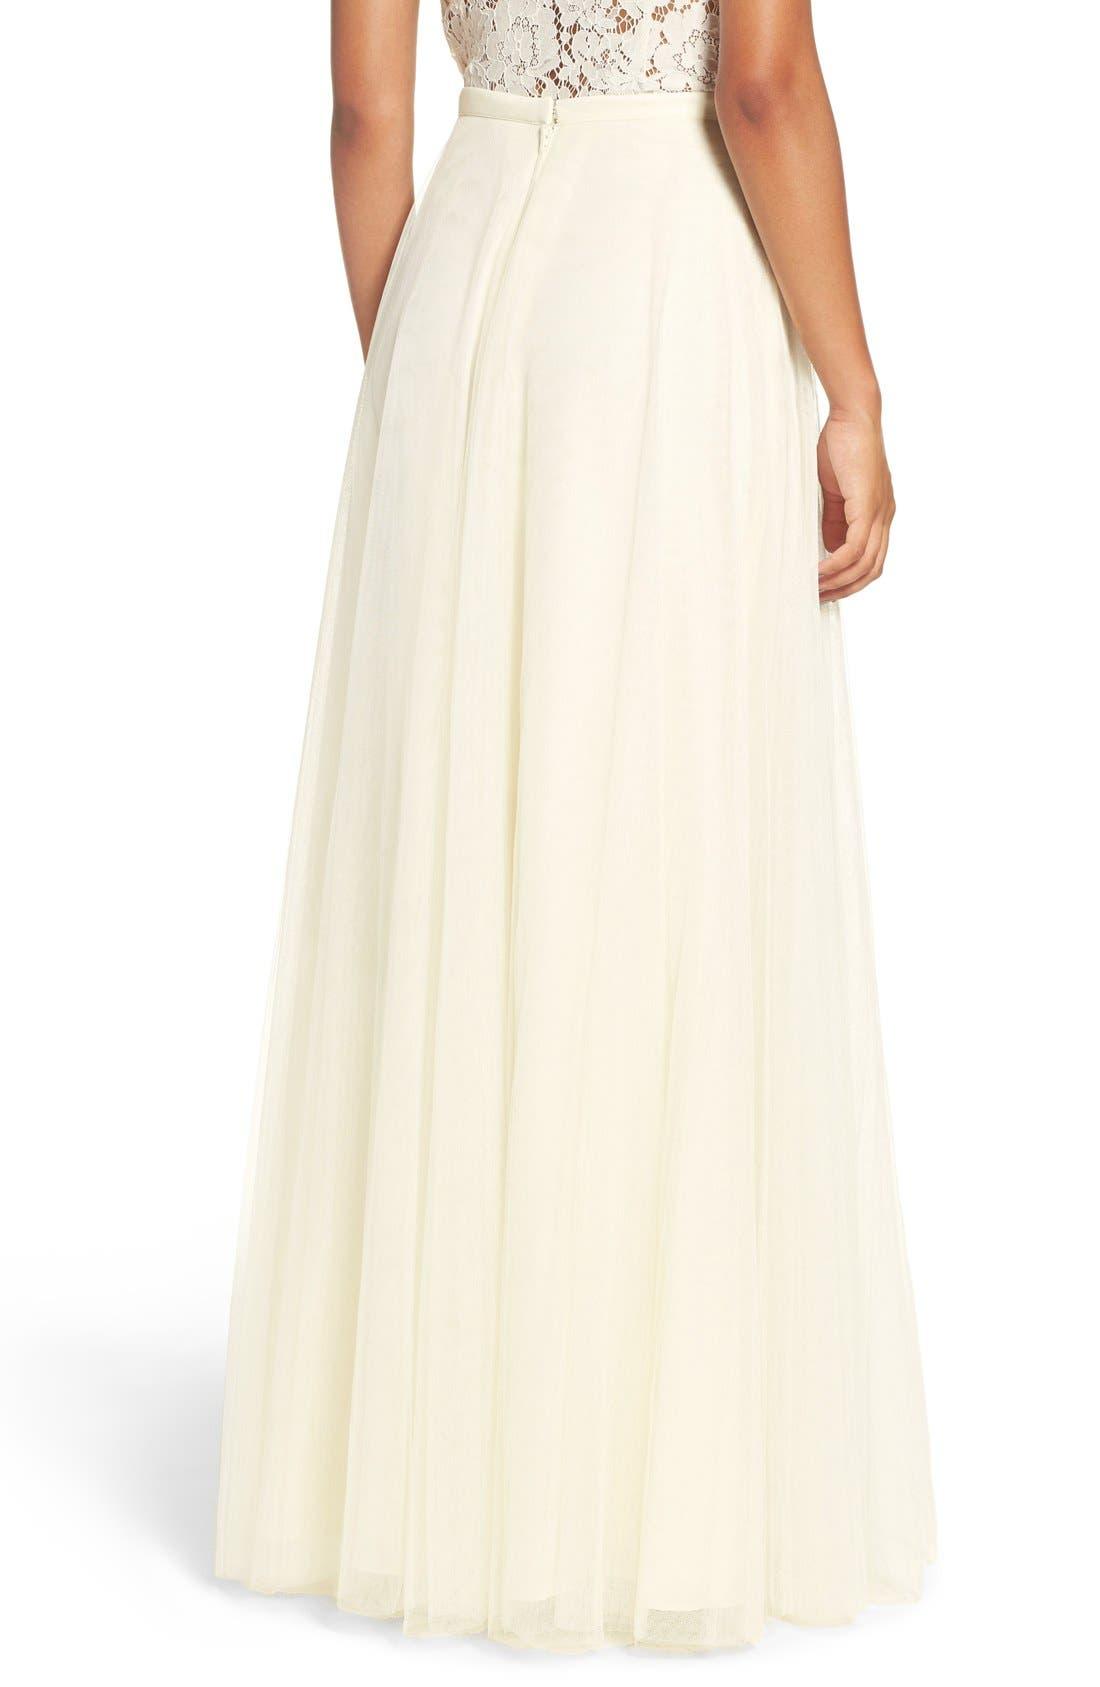 Winslow Long Tulle A-Line Skirt,                             Alternate thumbnail 3, color,                             104